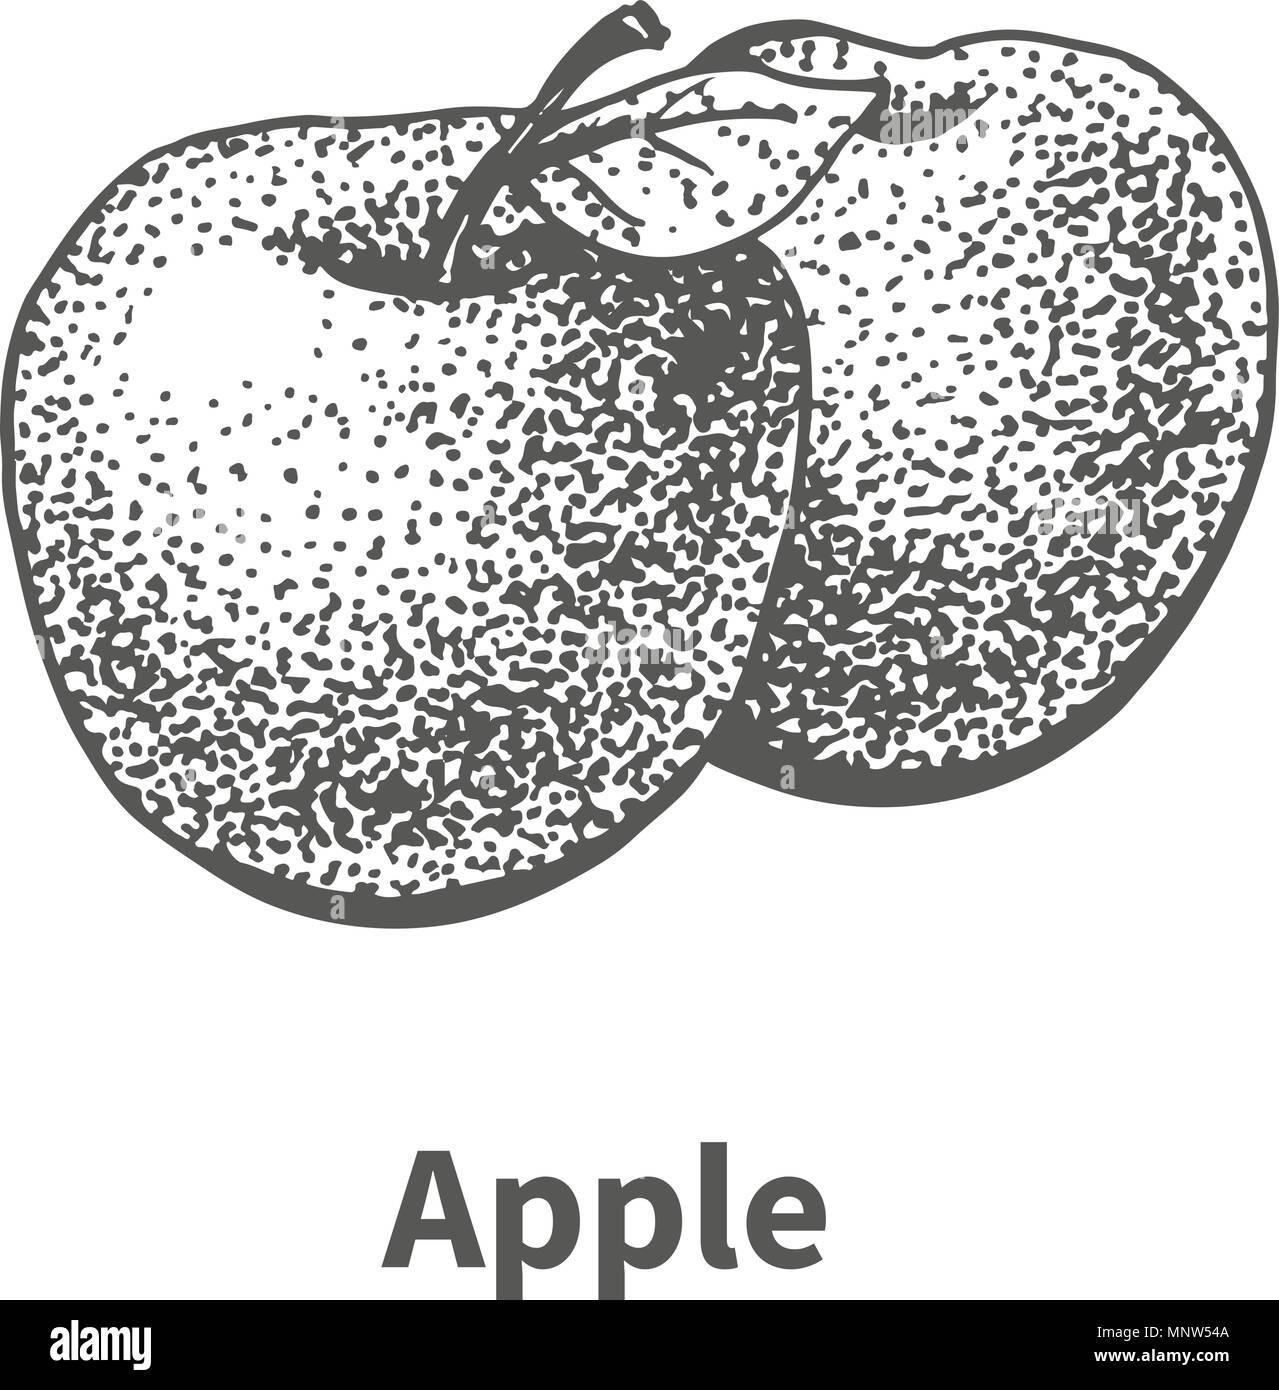 Vector illustration hand-drawn apple - Stock Image